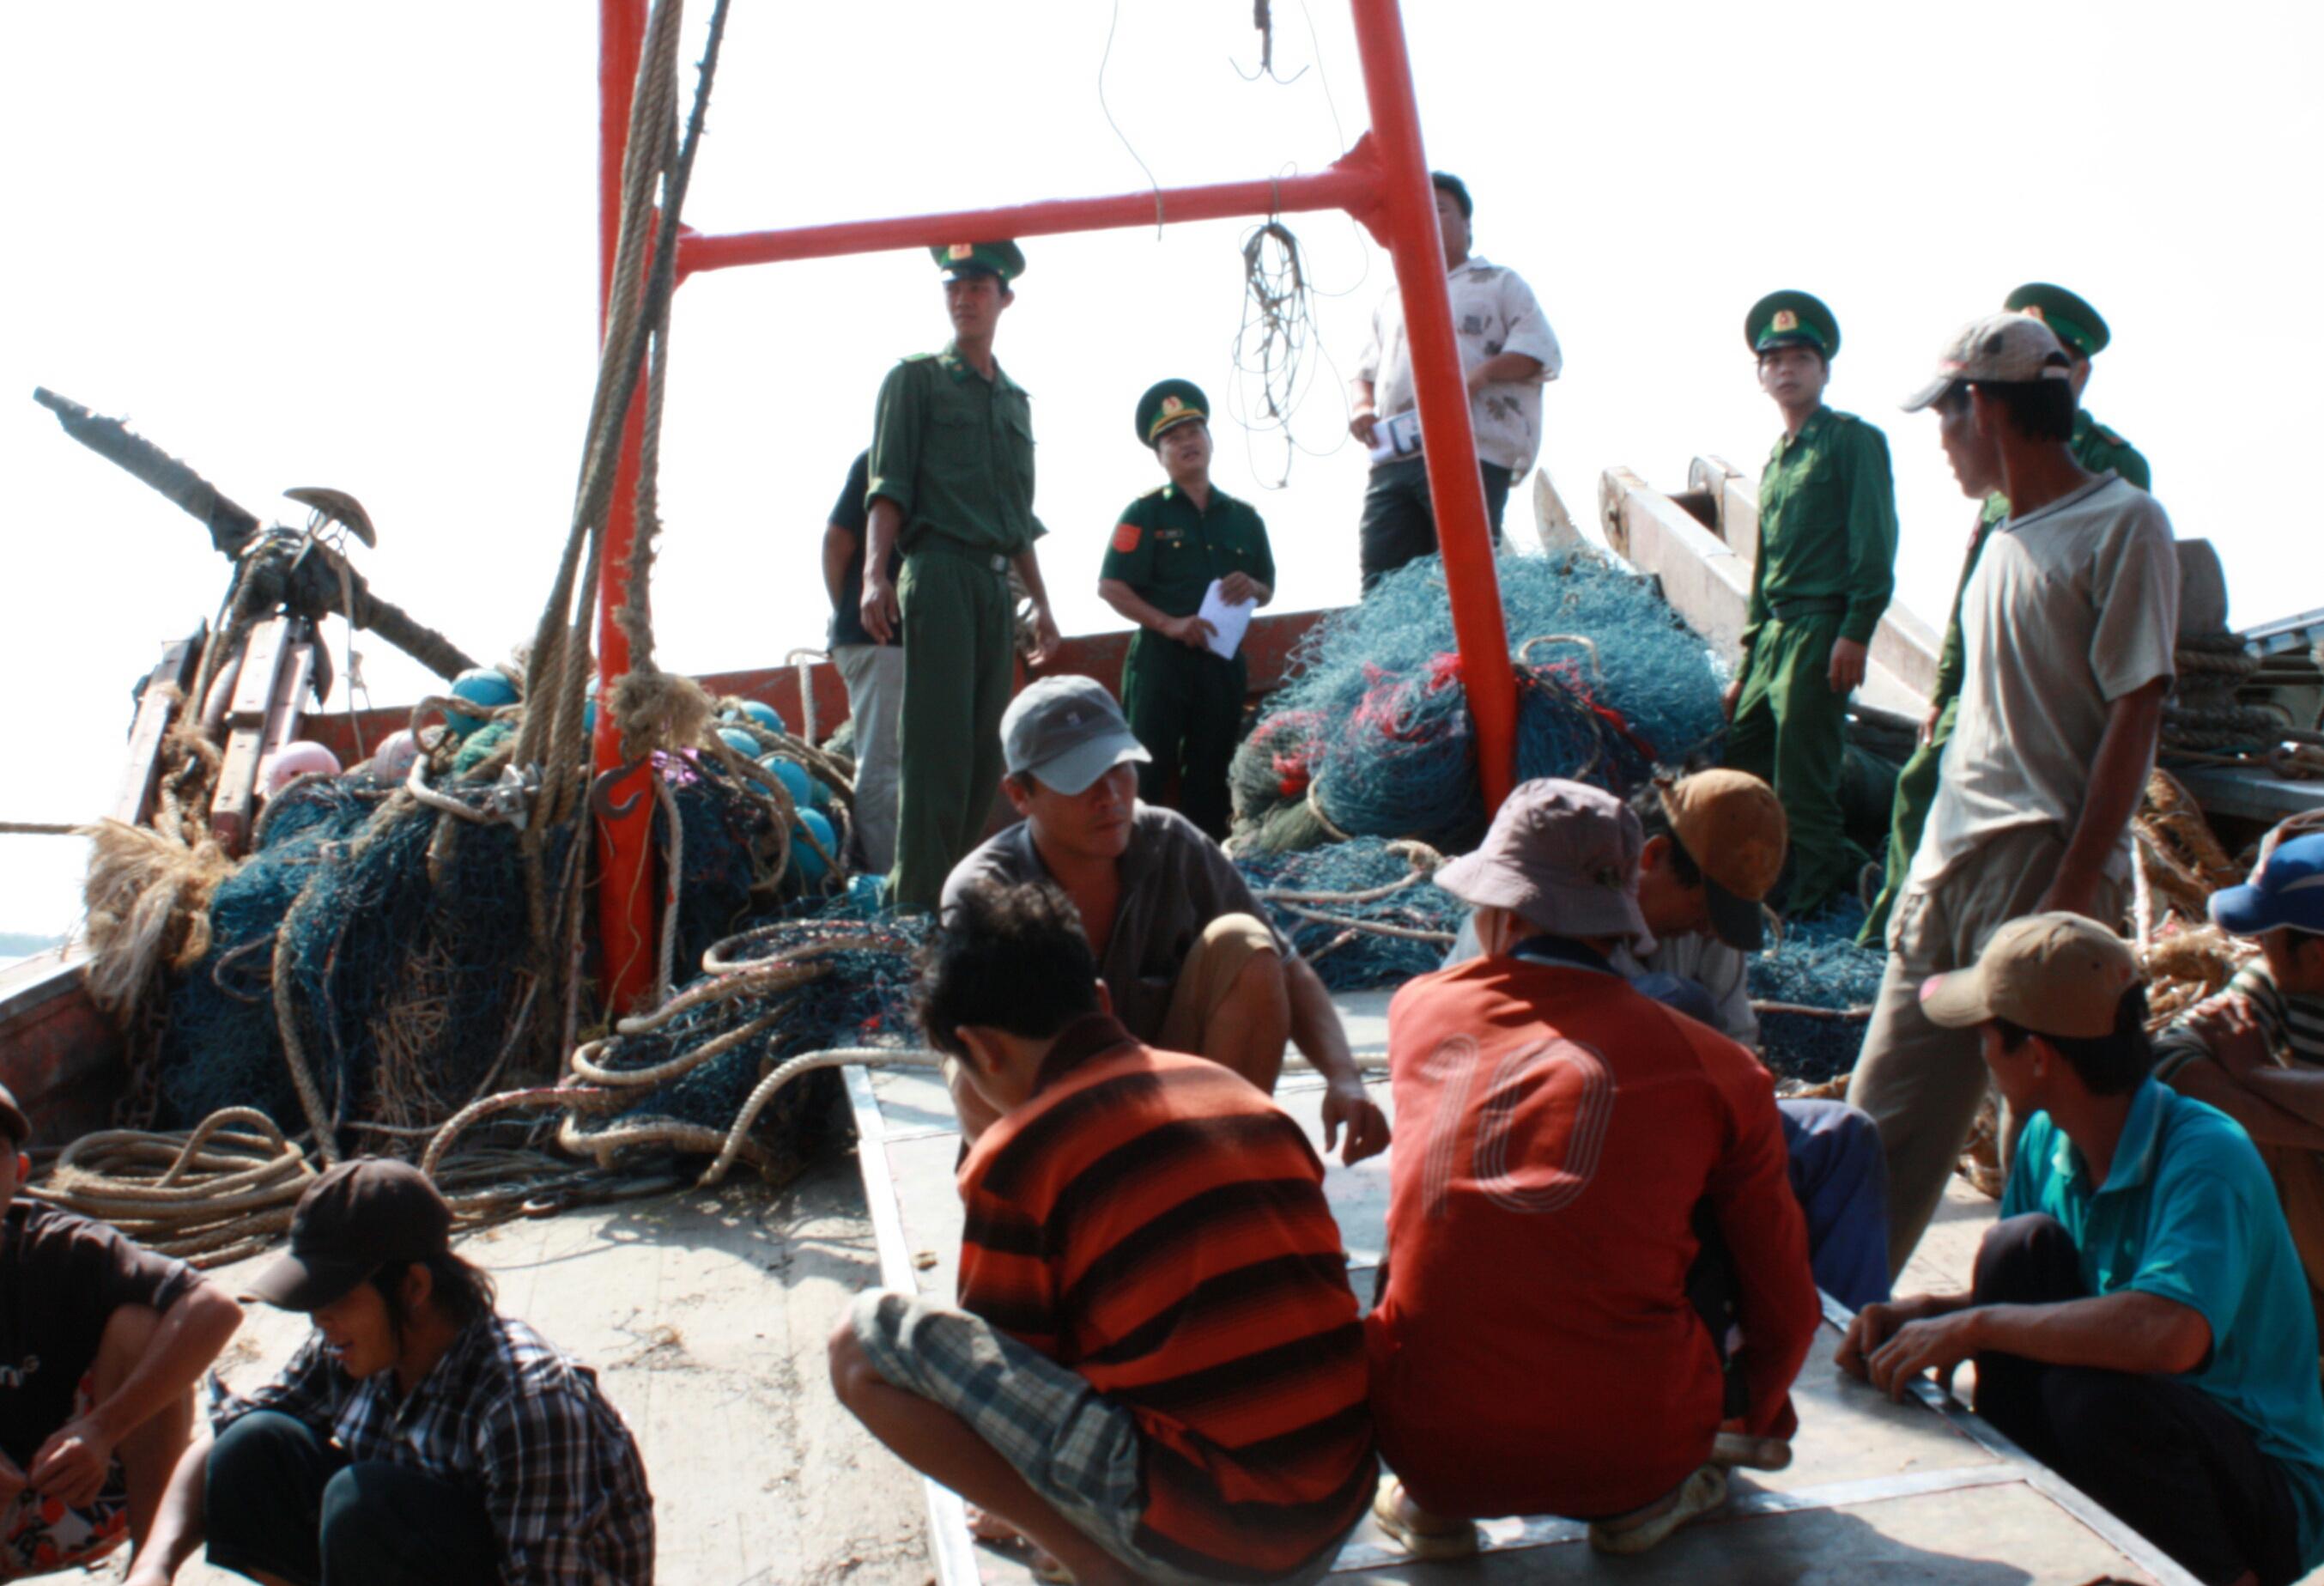 Shooting at Vietnamese fishermen act of violating international law: experts